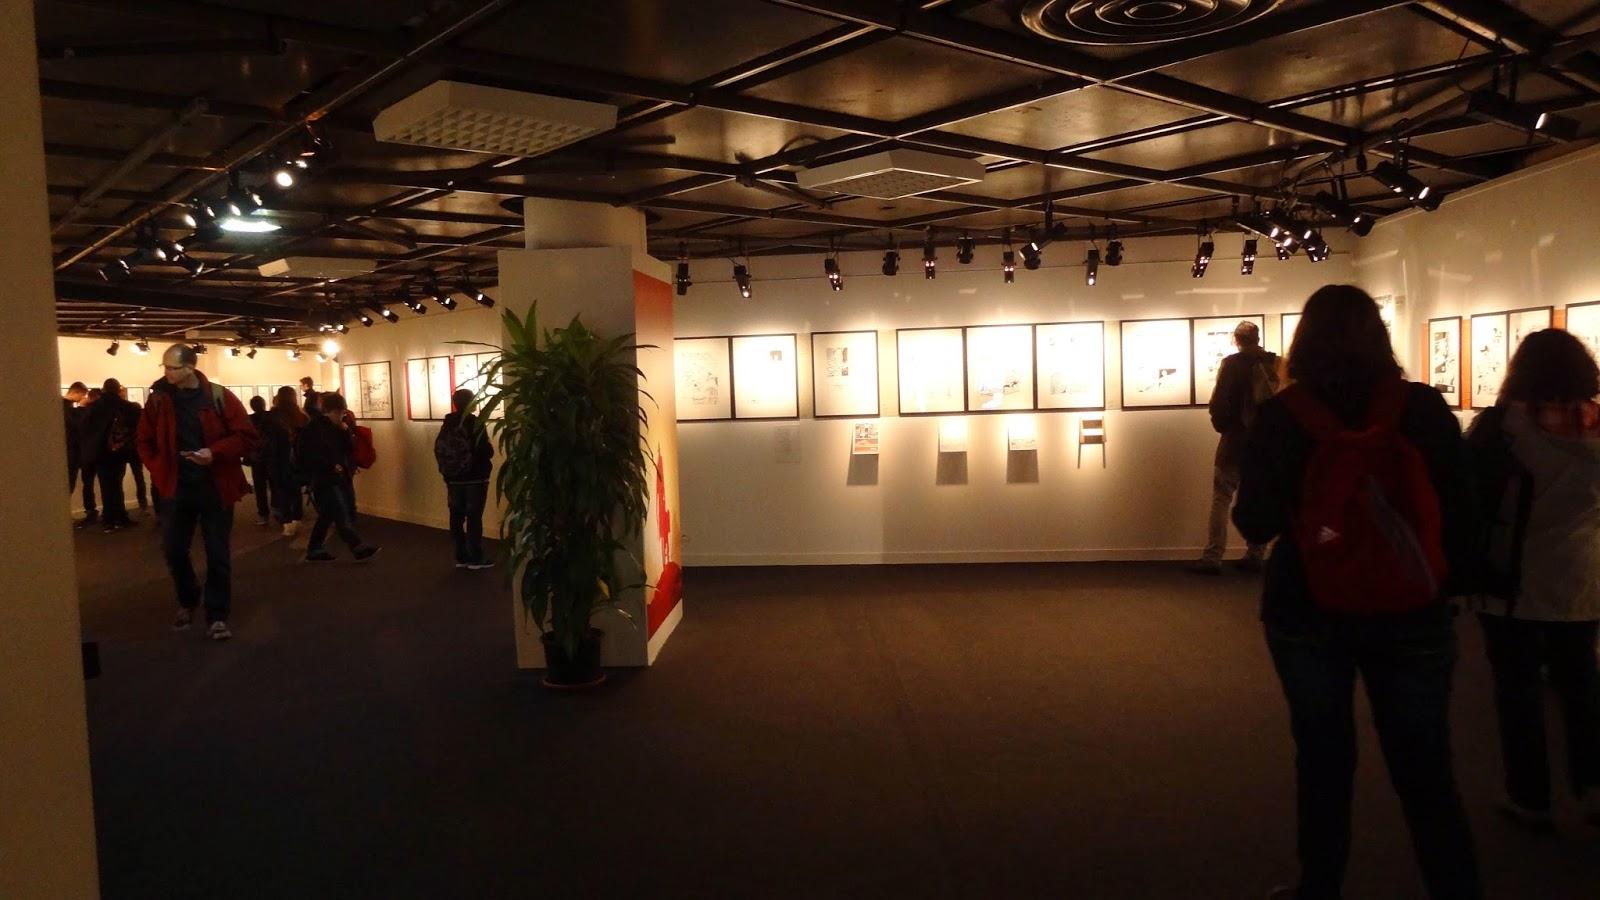 Exposition Fabien Nury, intérieur, FIBD Angoulême 2015